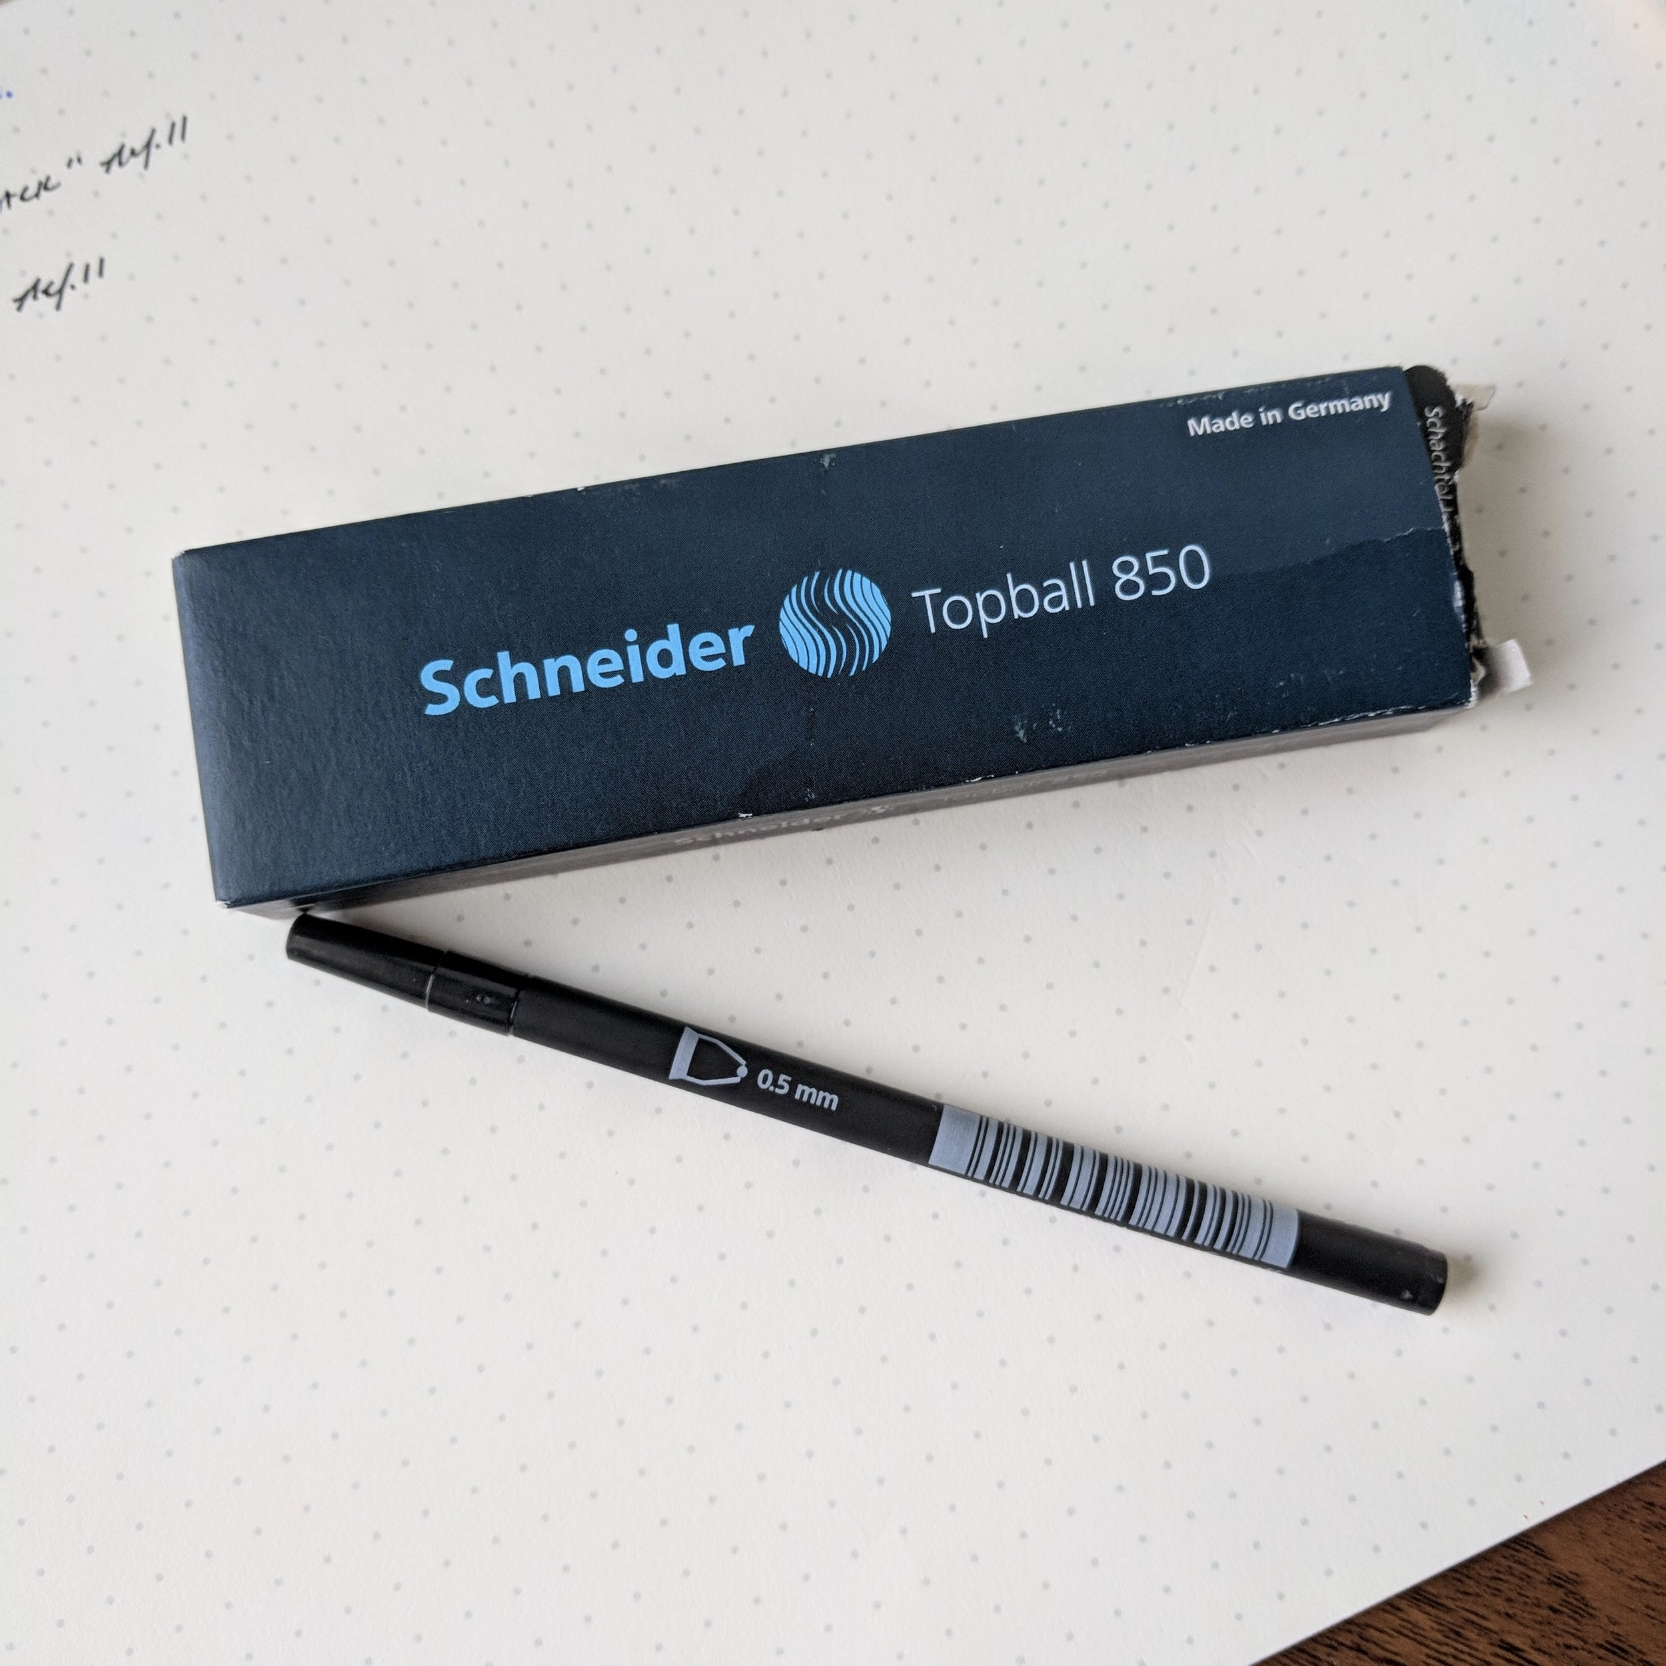 Schneider-Topball-850-Refill